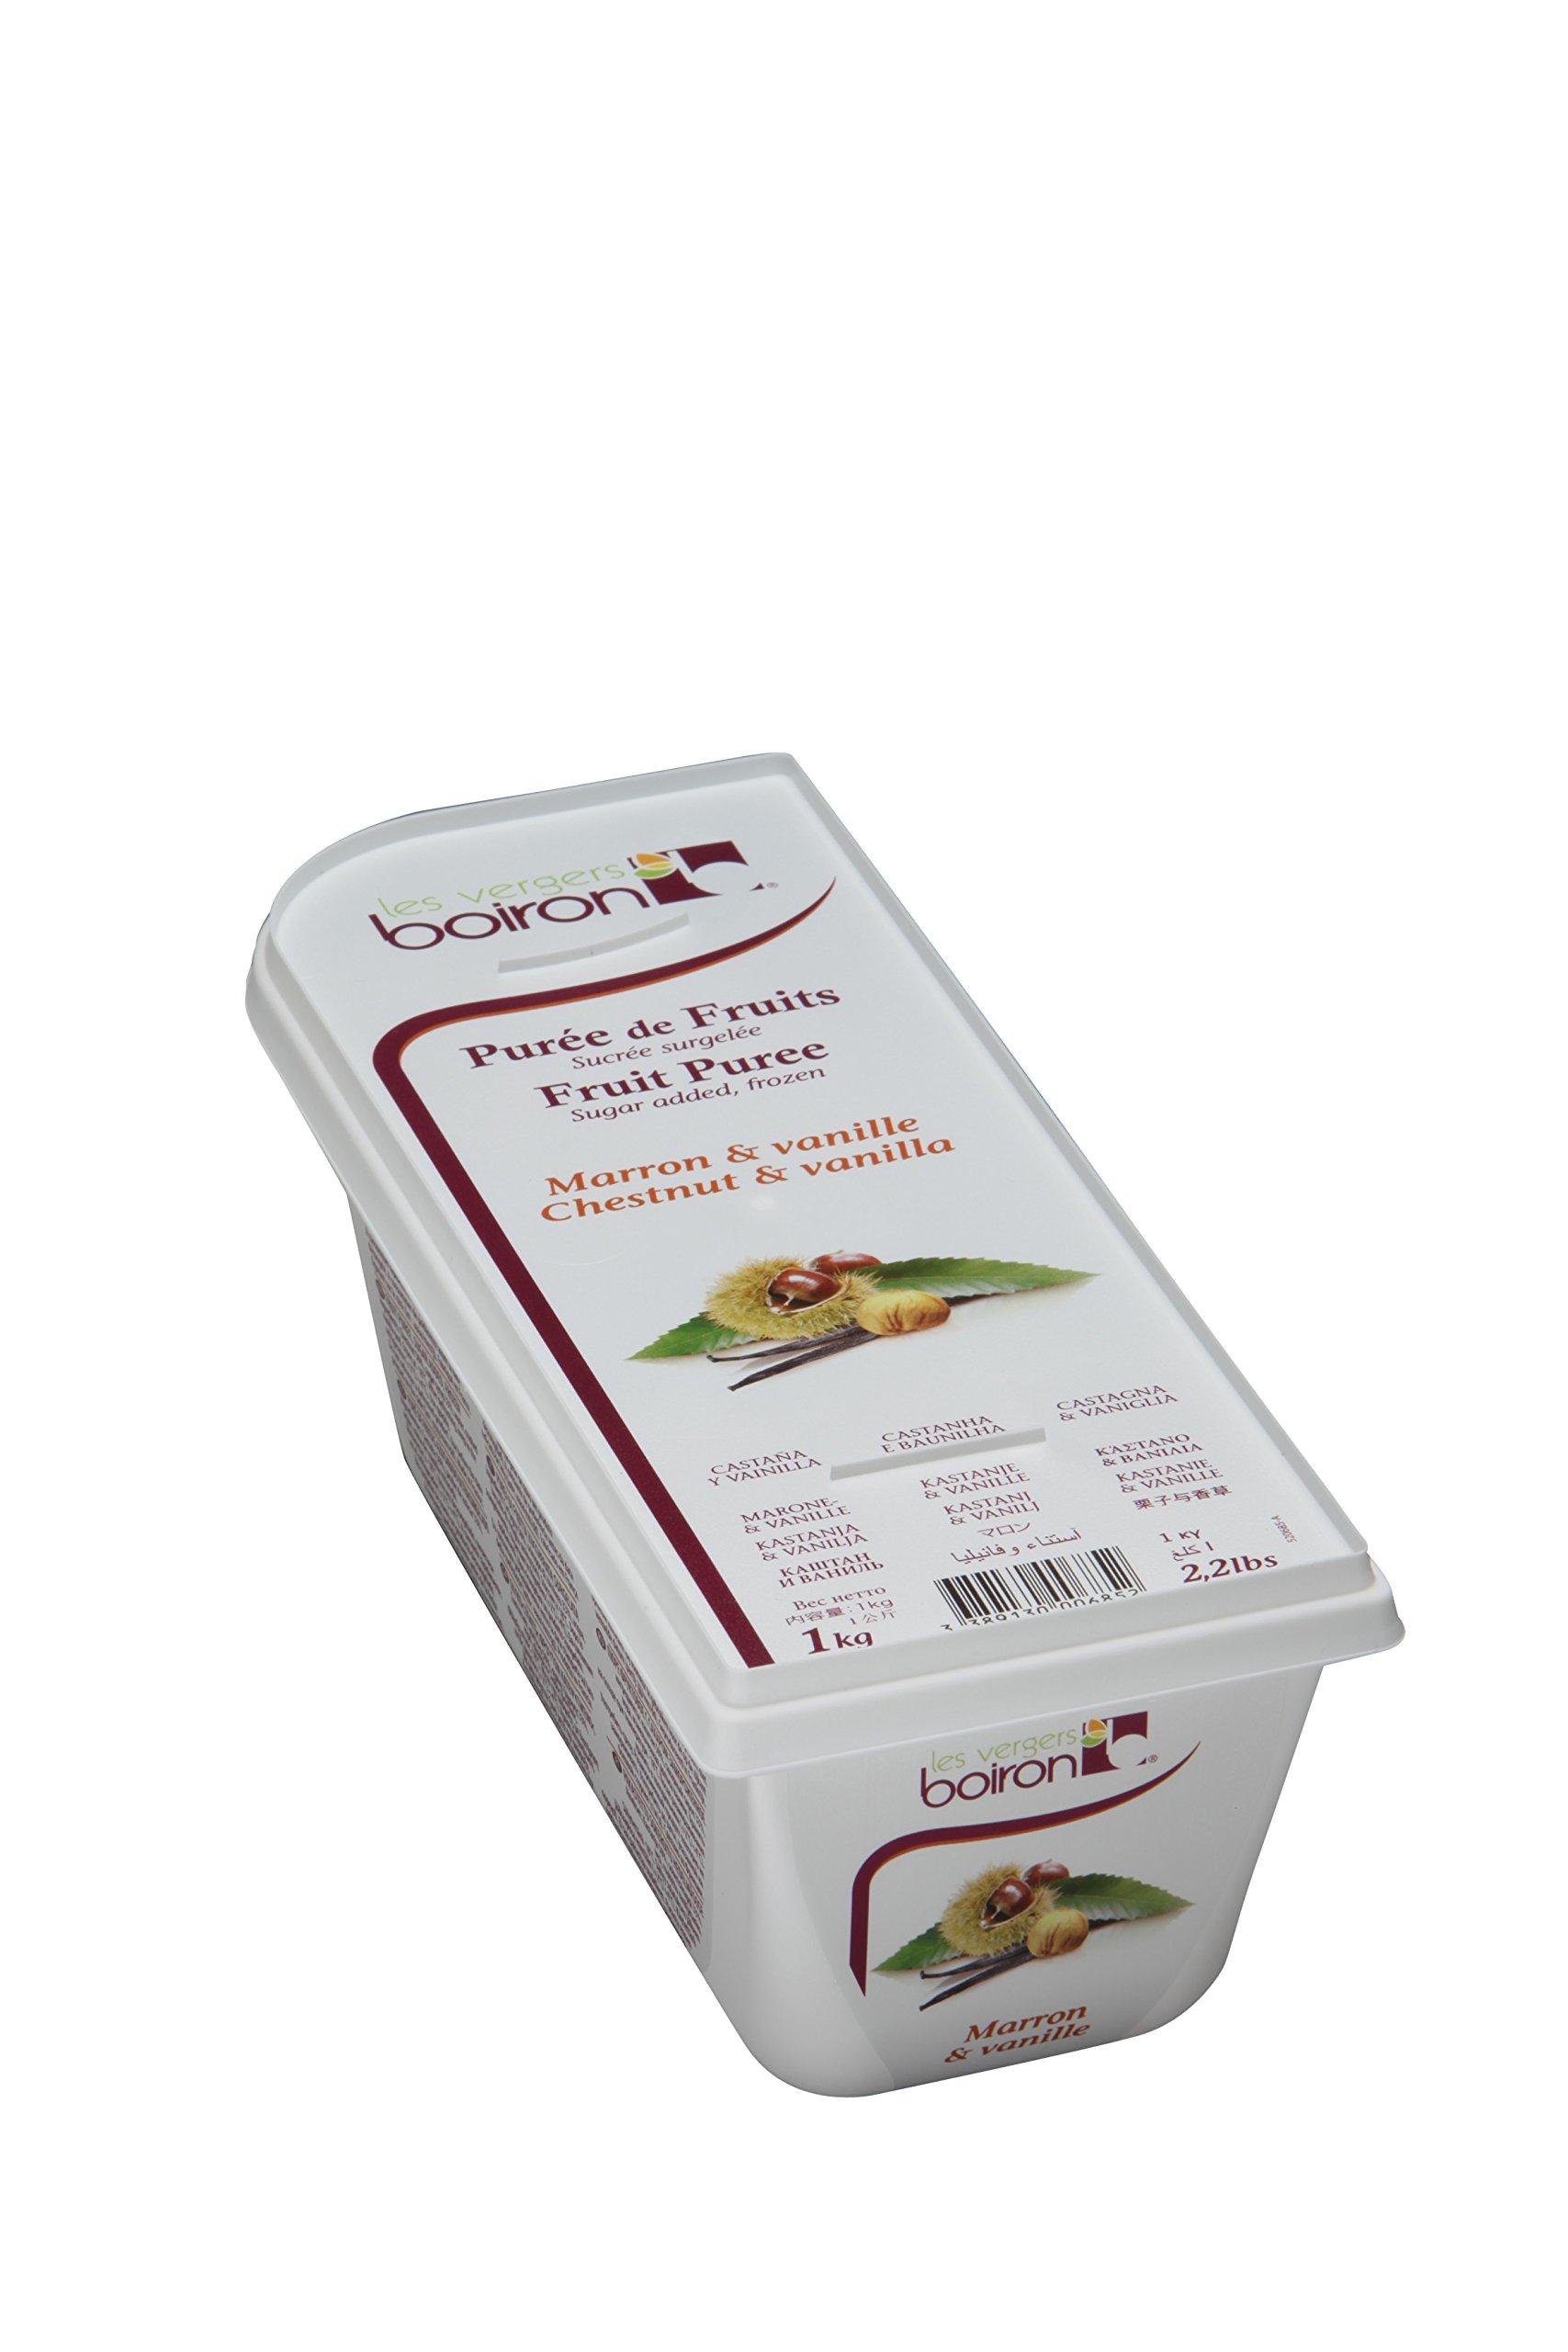 Chestnut and Vanilla Puree - Frozen - 50% Fruit - 2.2Lbs - Kosher